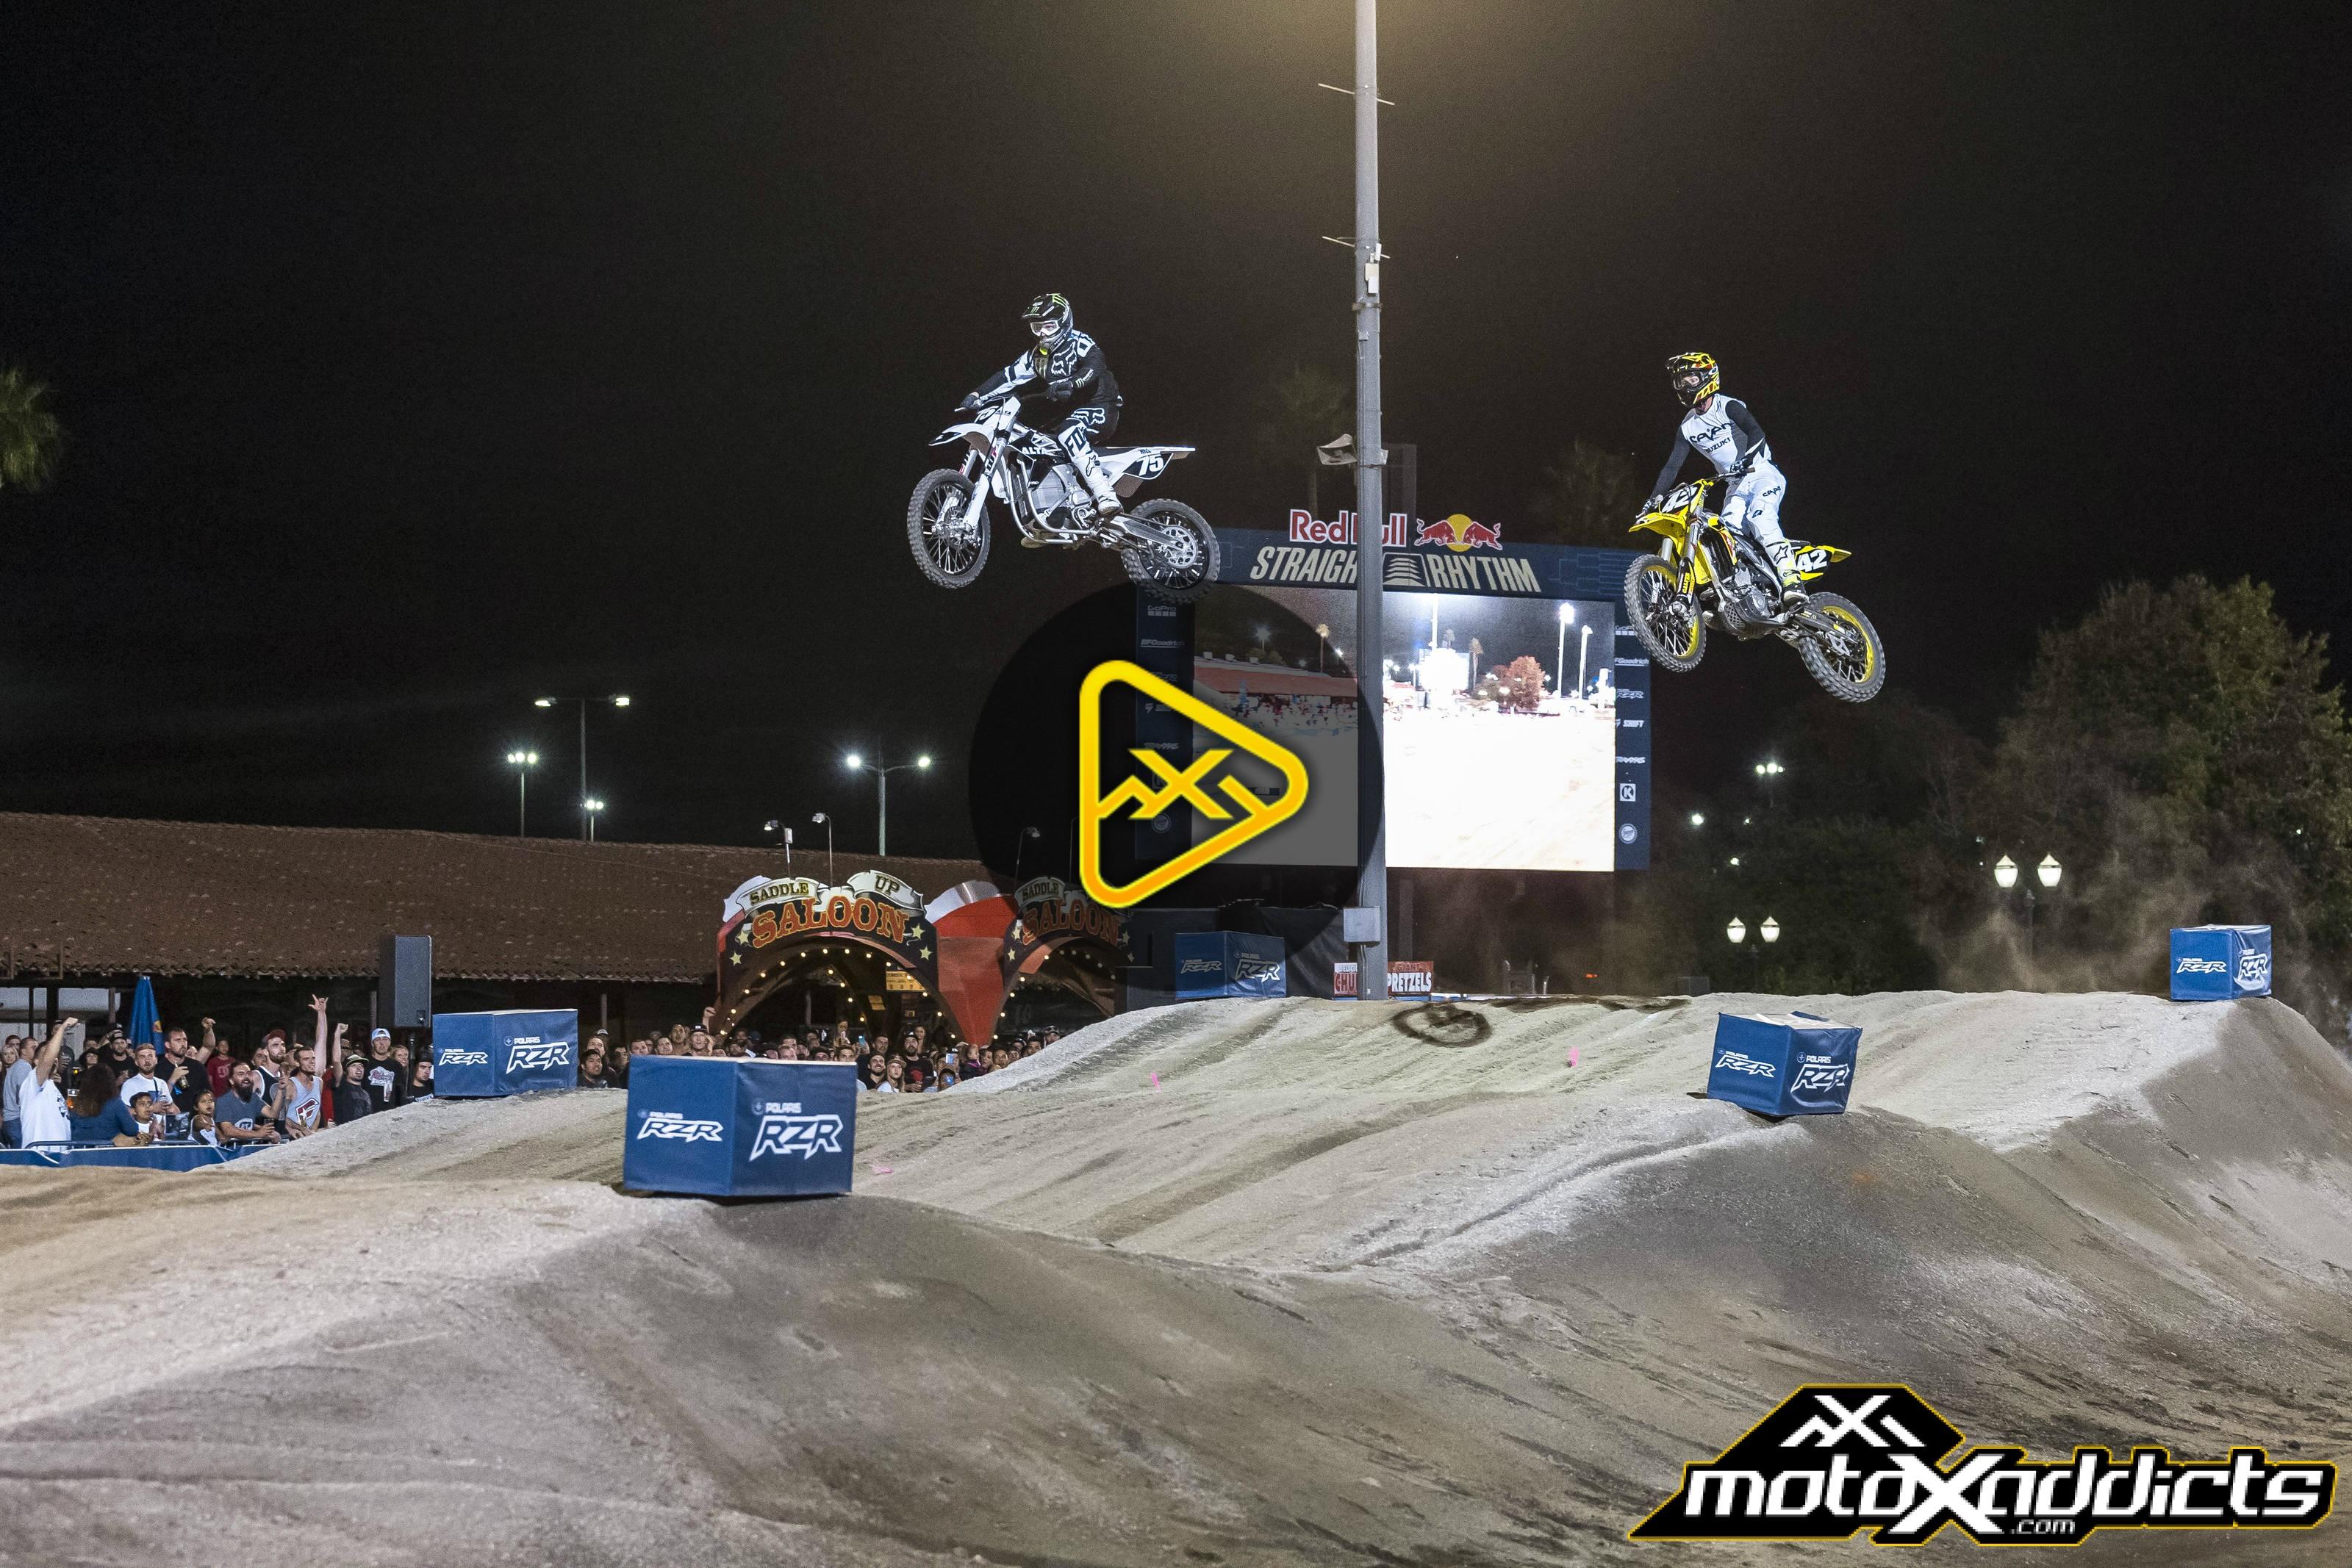 Josh Hill Gets a Win on the Alta Electric Bike- 2016 Straight Rhythm